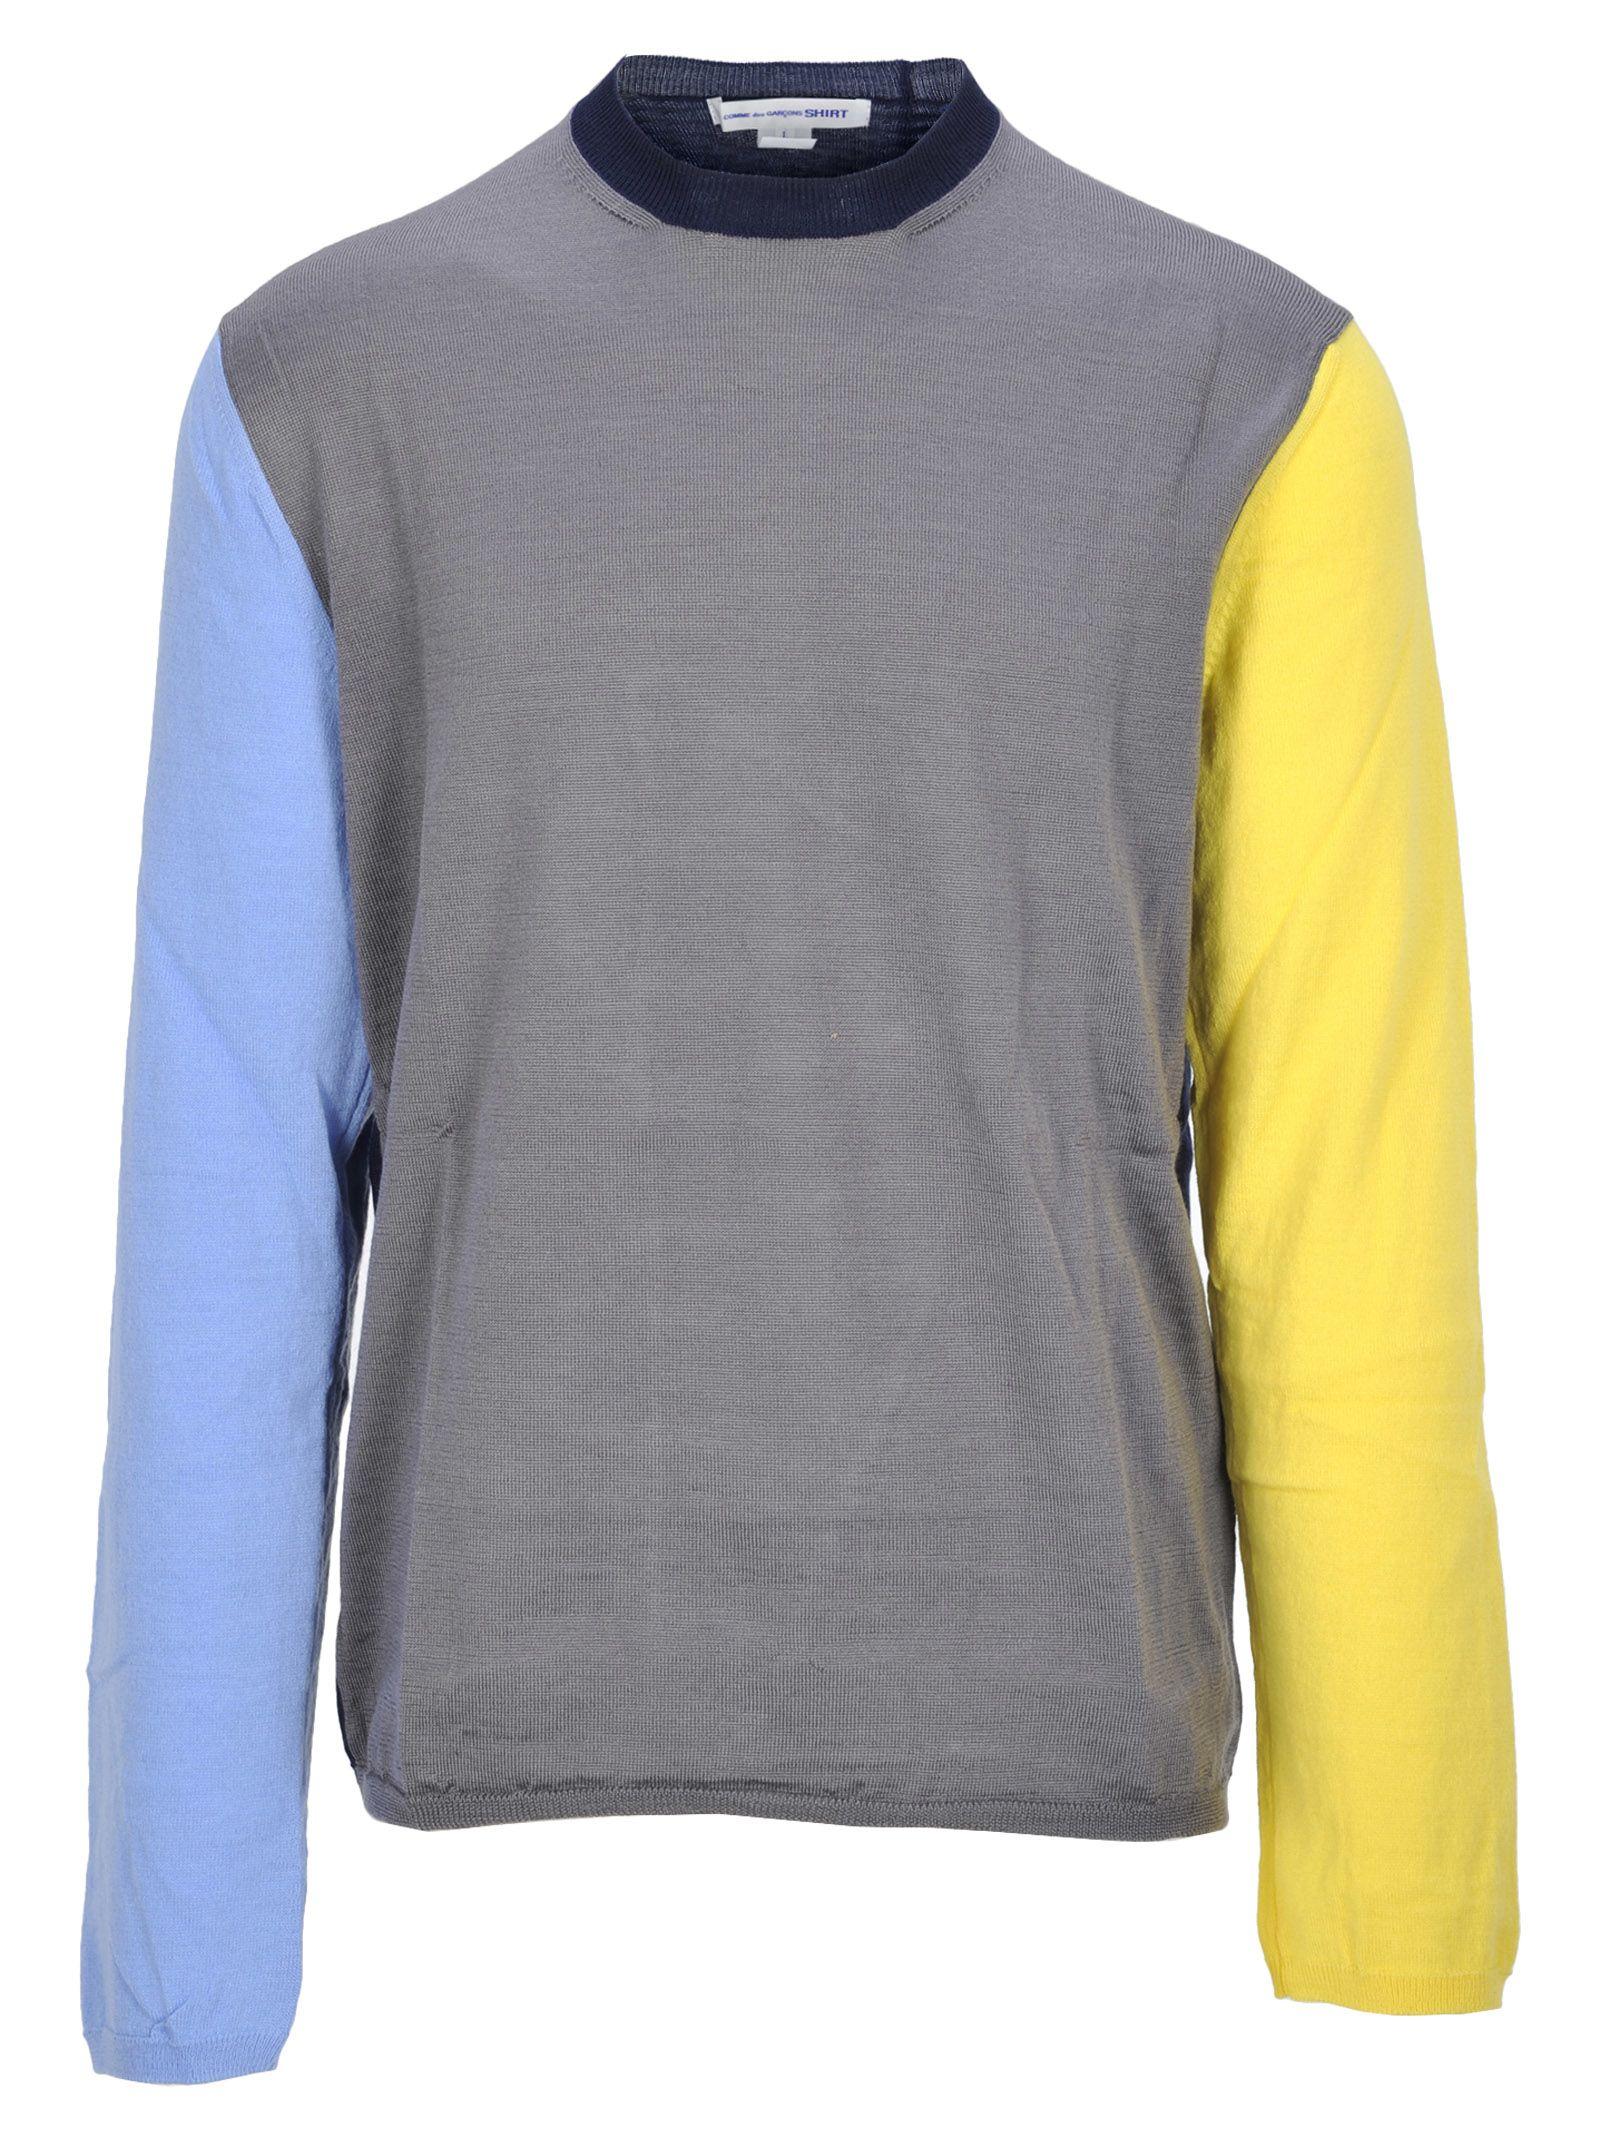 COMME DES GARÇONS BOYS Comme Des Garçons Boy Round Neck in Grey Yellow